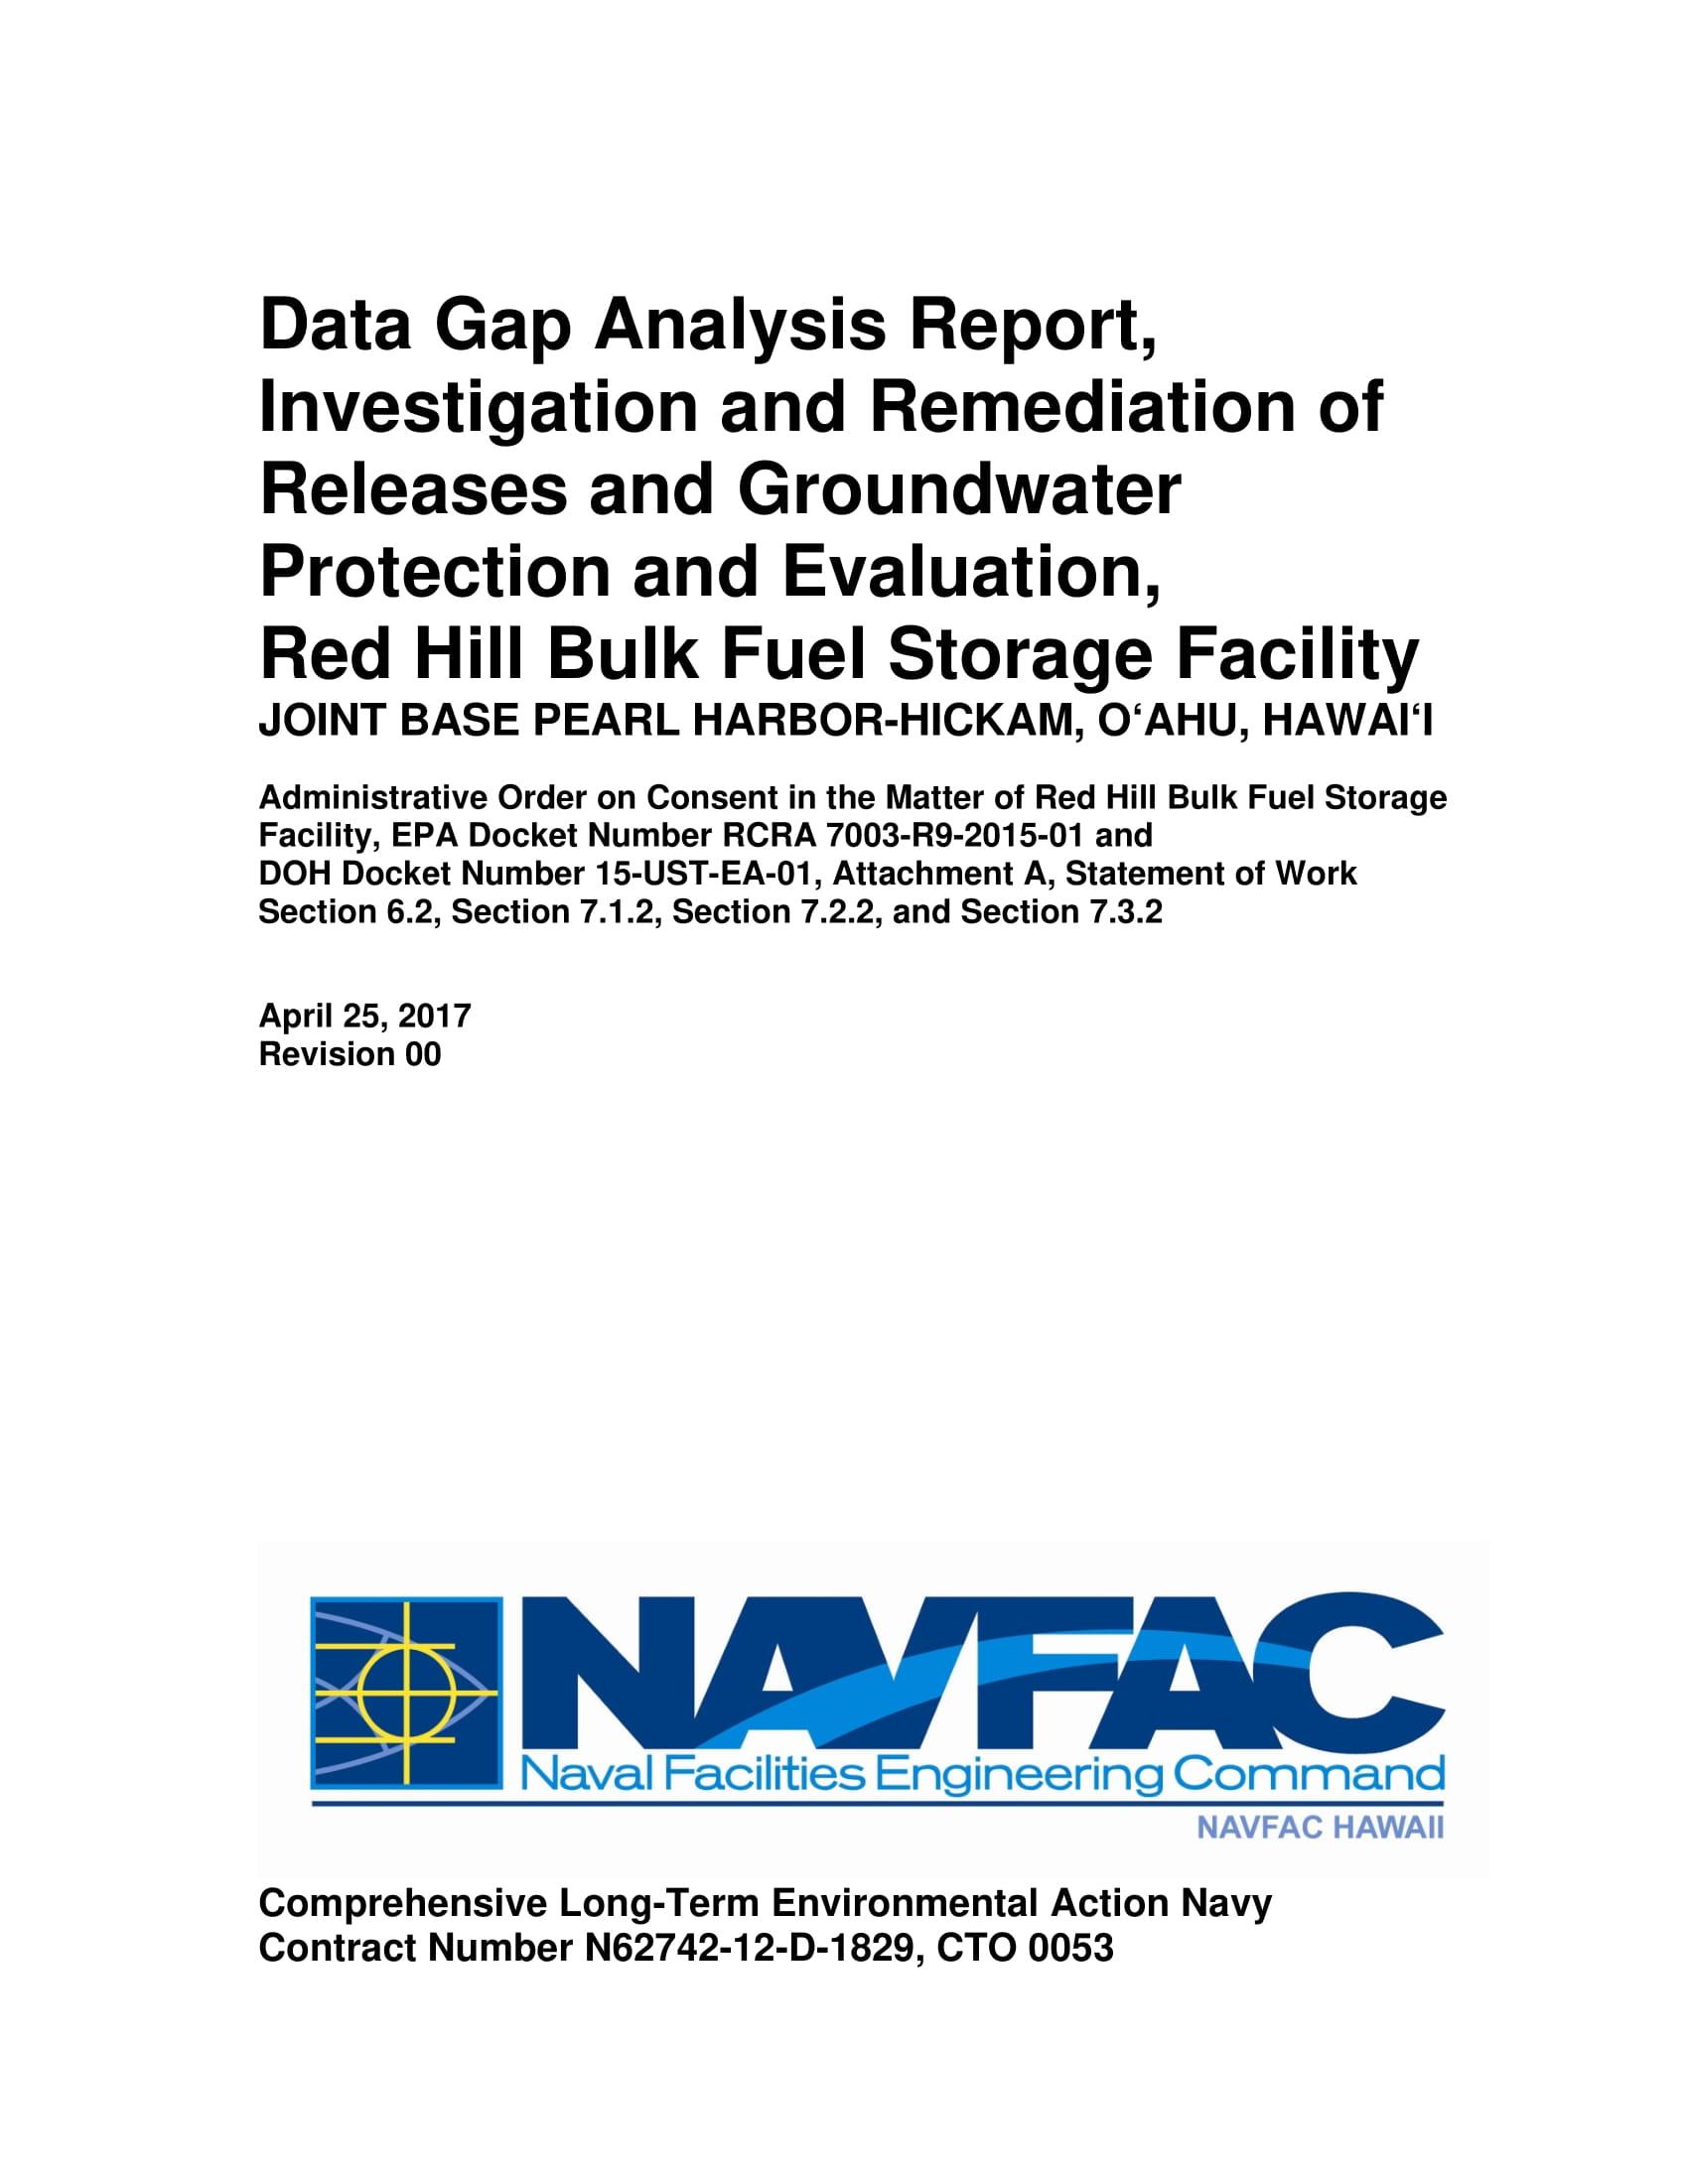 data gap analysis report example 01